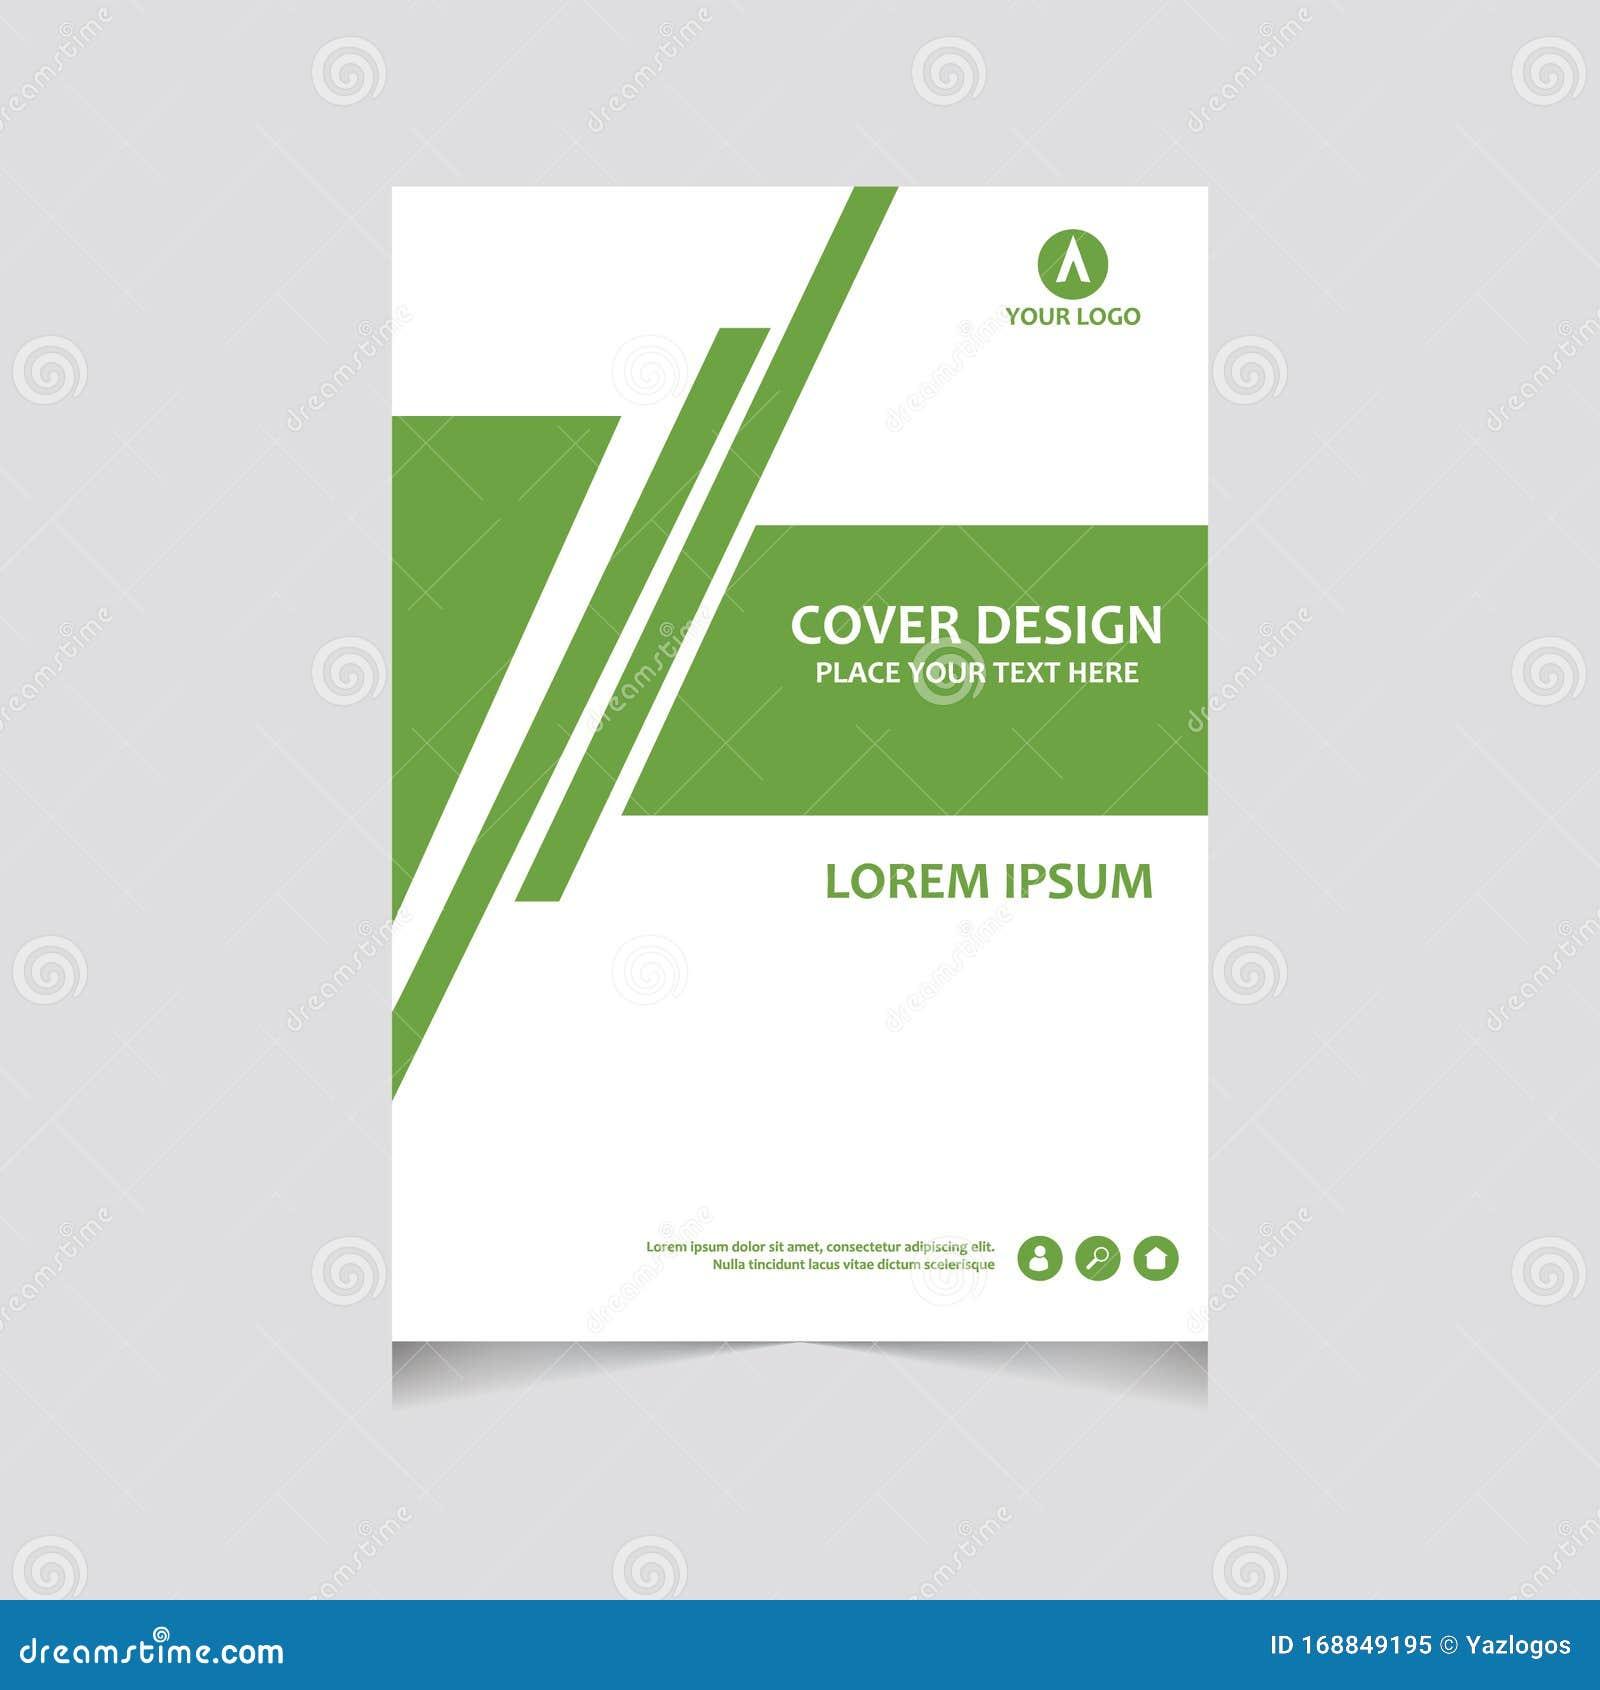 annual report  pamphlet  presentation  brochure  front